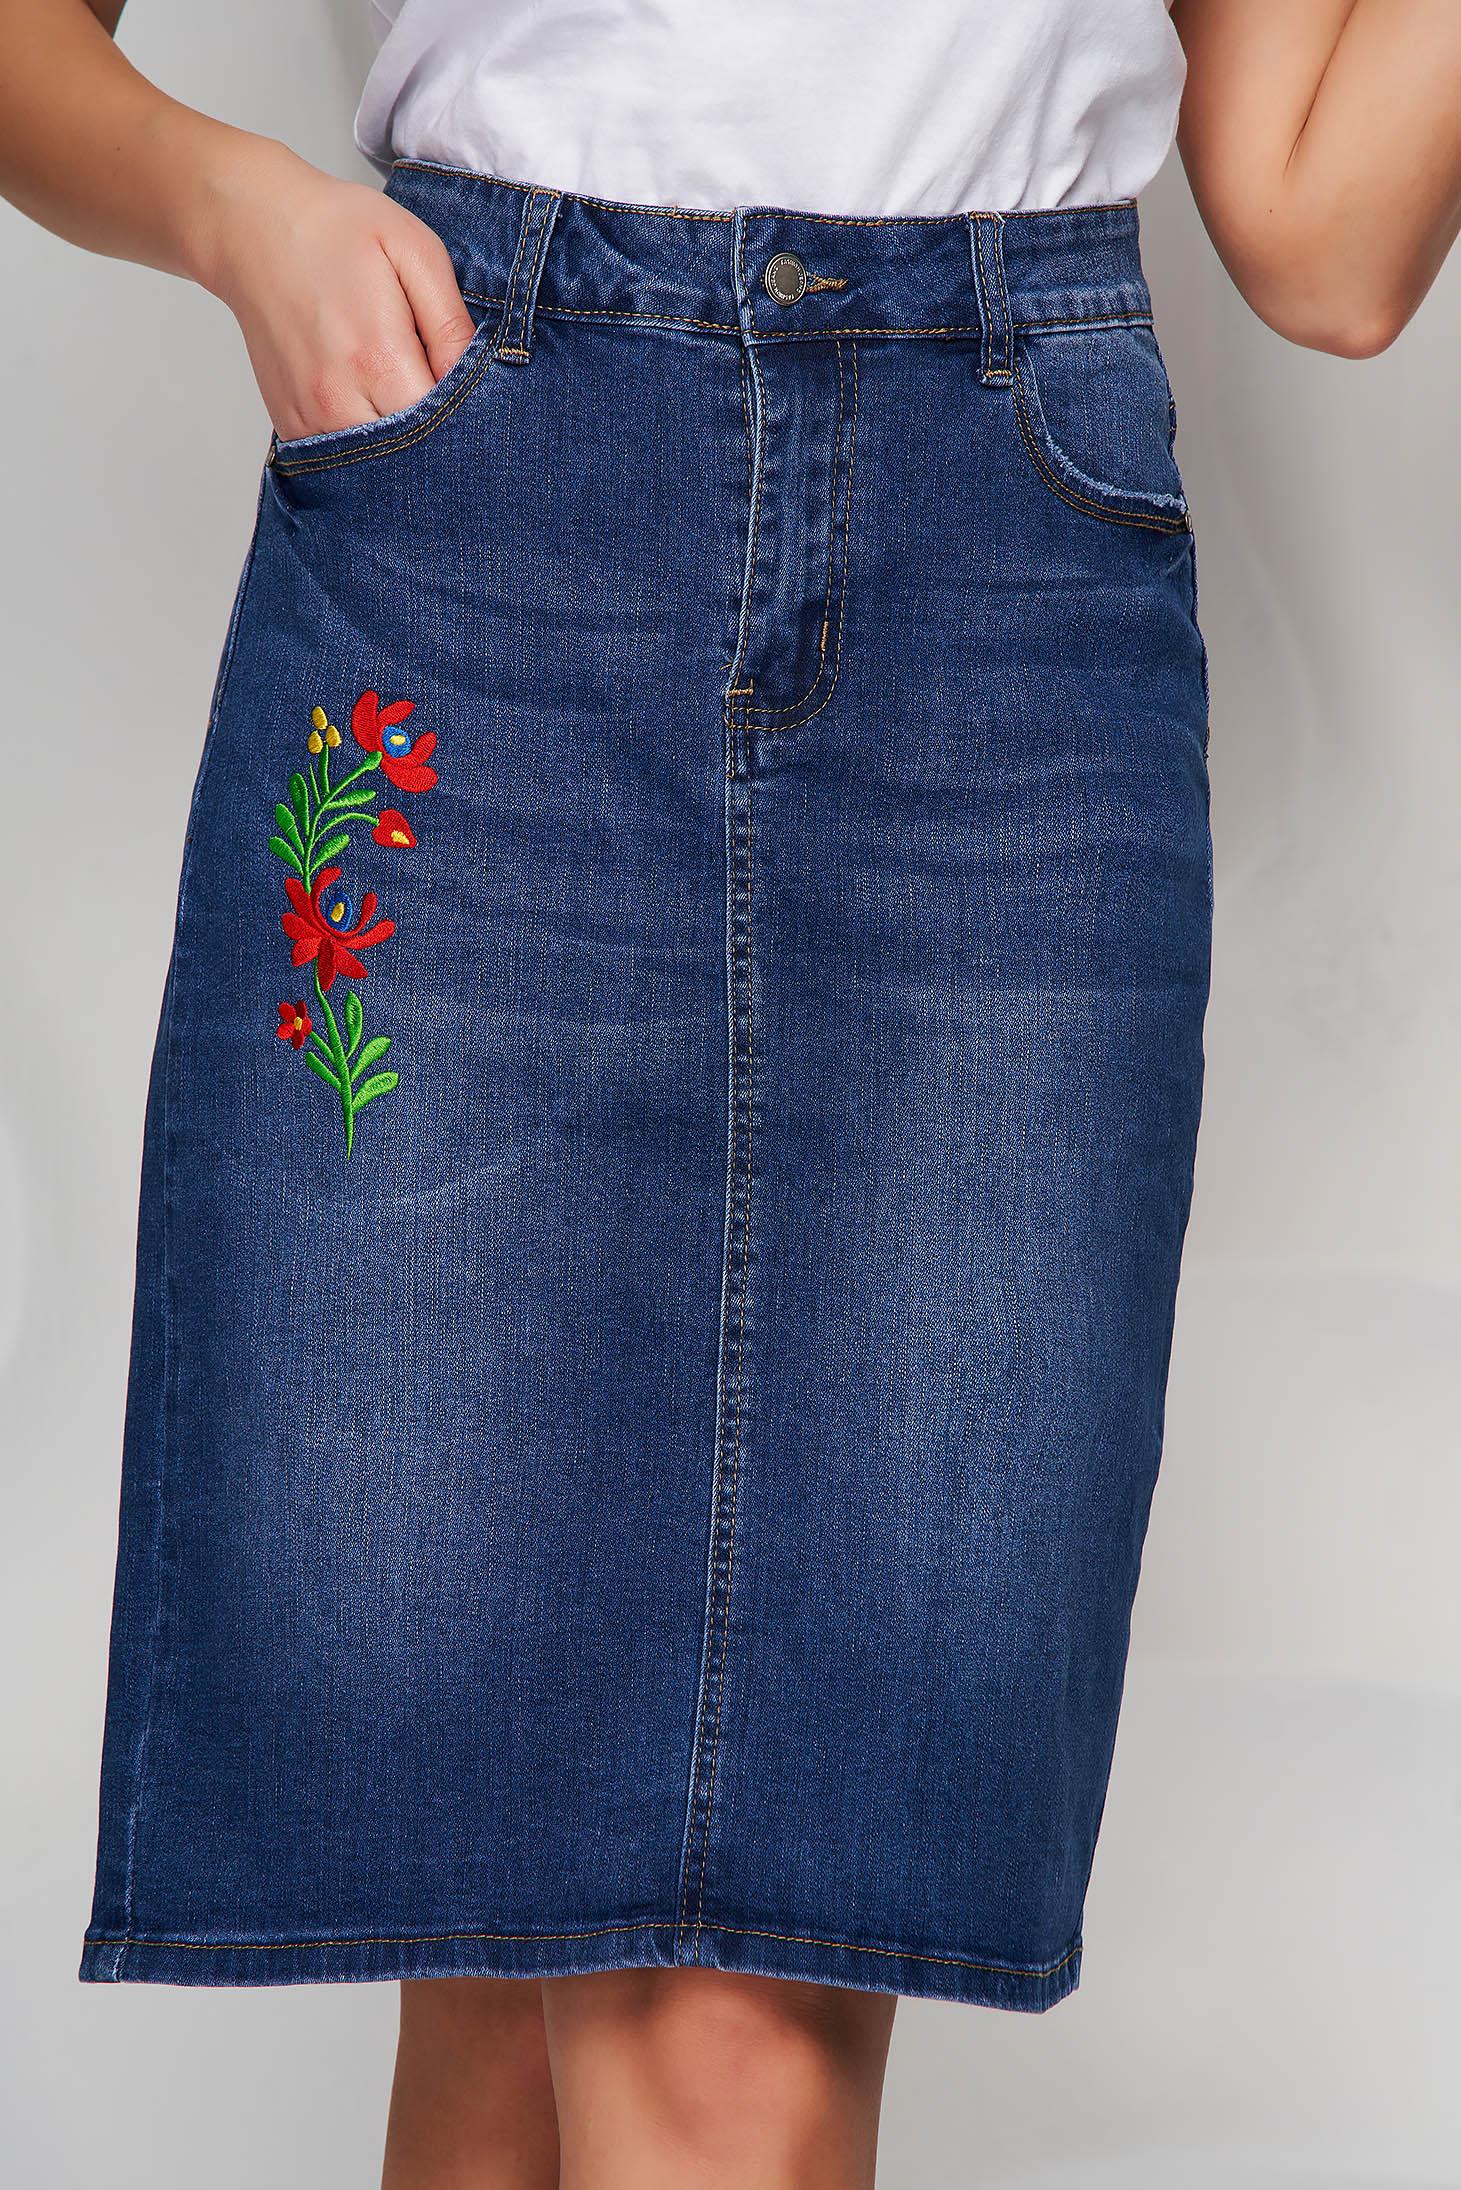 Blue skirt denim high waisted embroidered midi straight